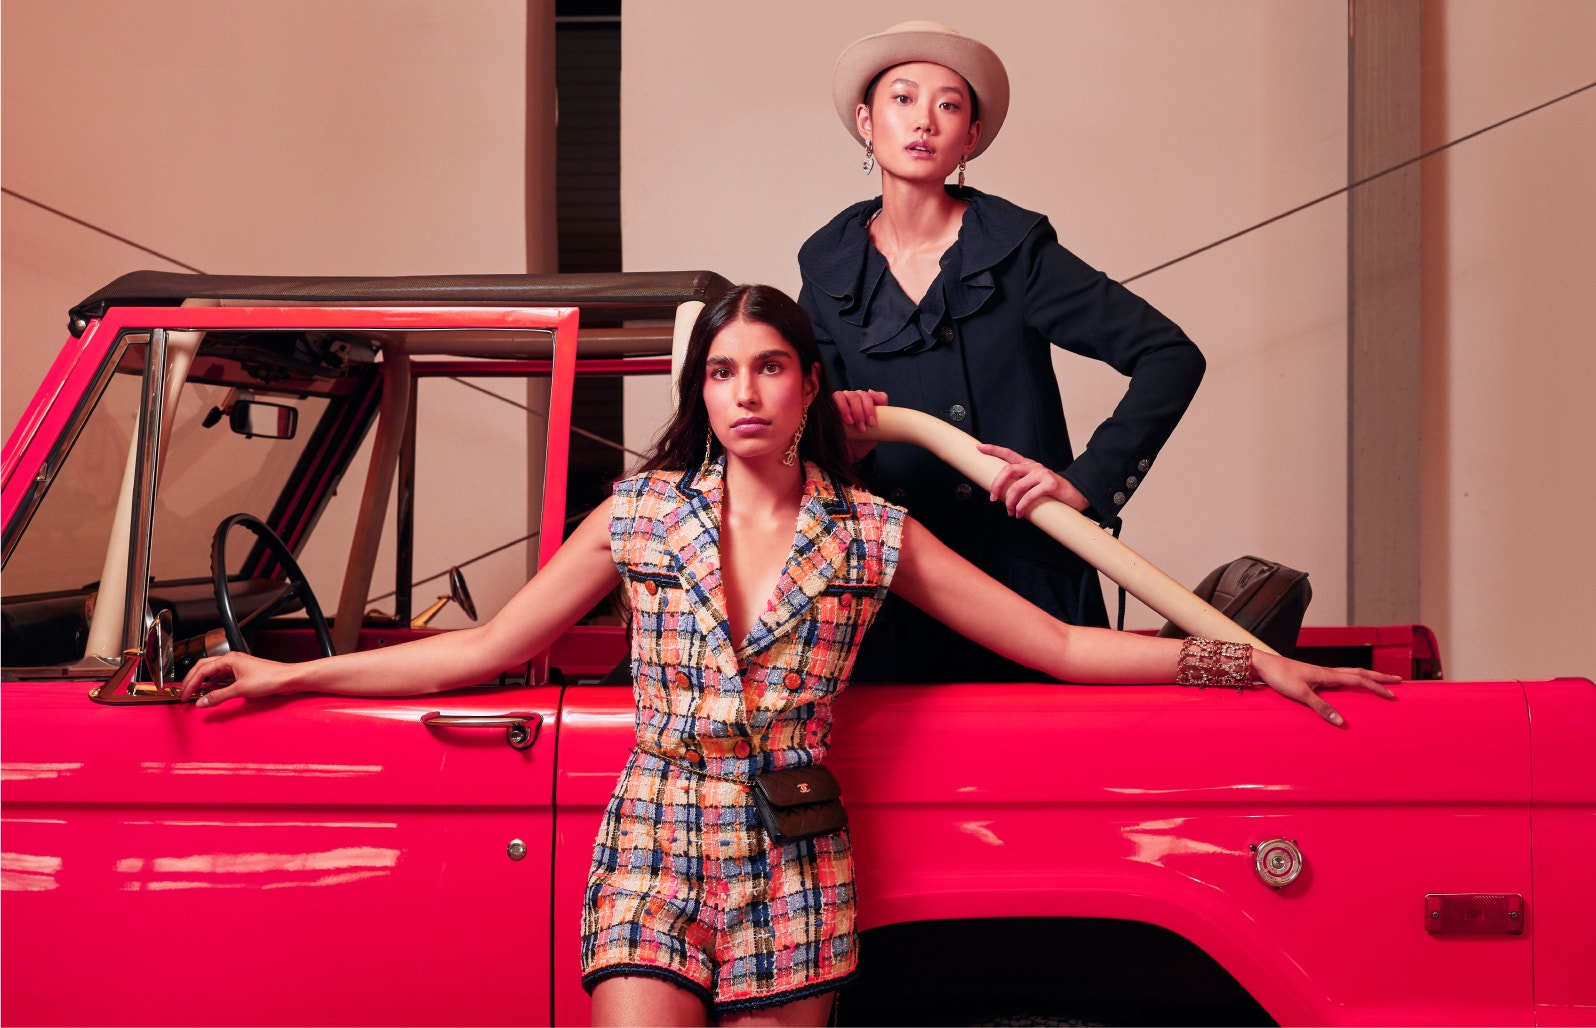 models wearing chanel spring-summer romper and navy jacket